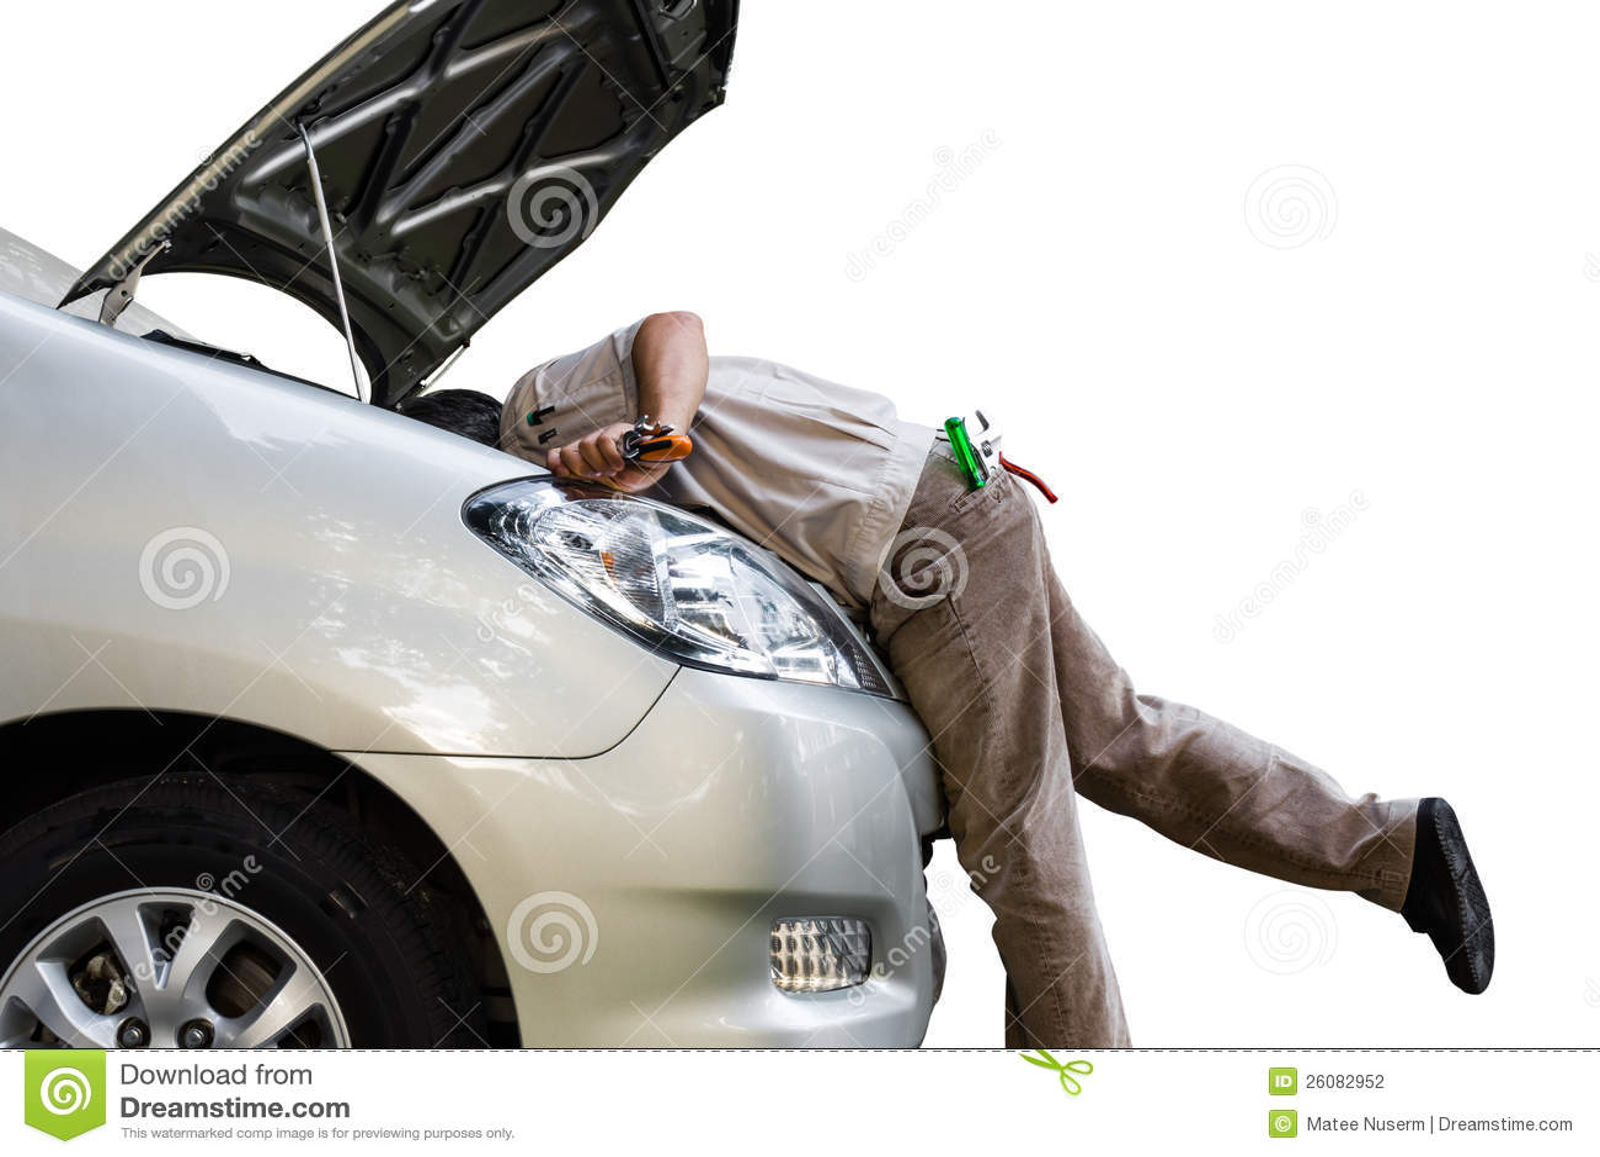 Troubleshooting автомобиля